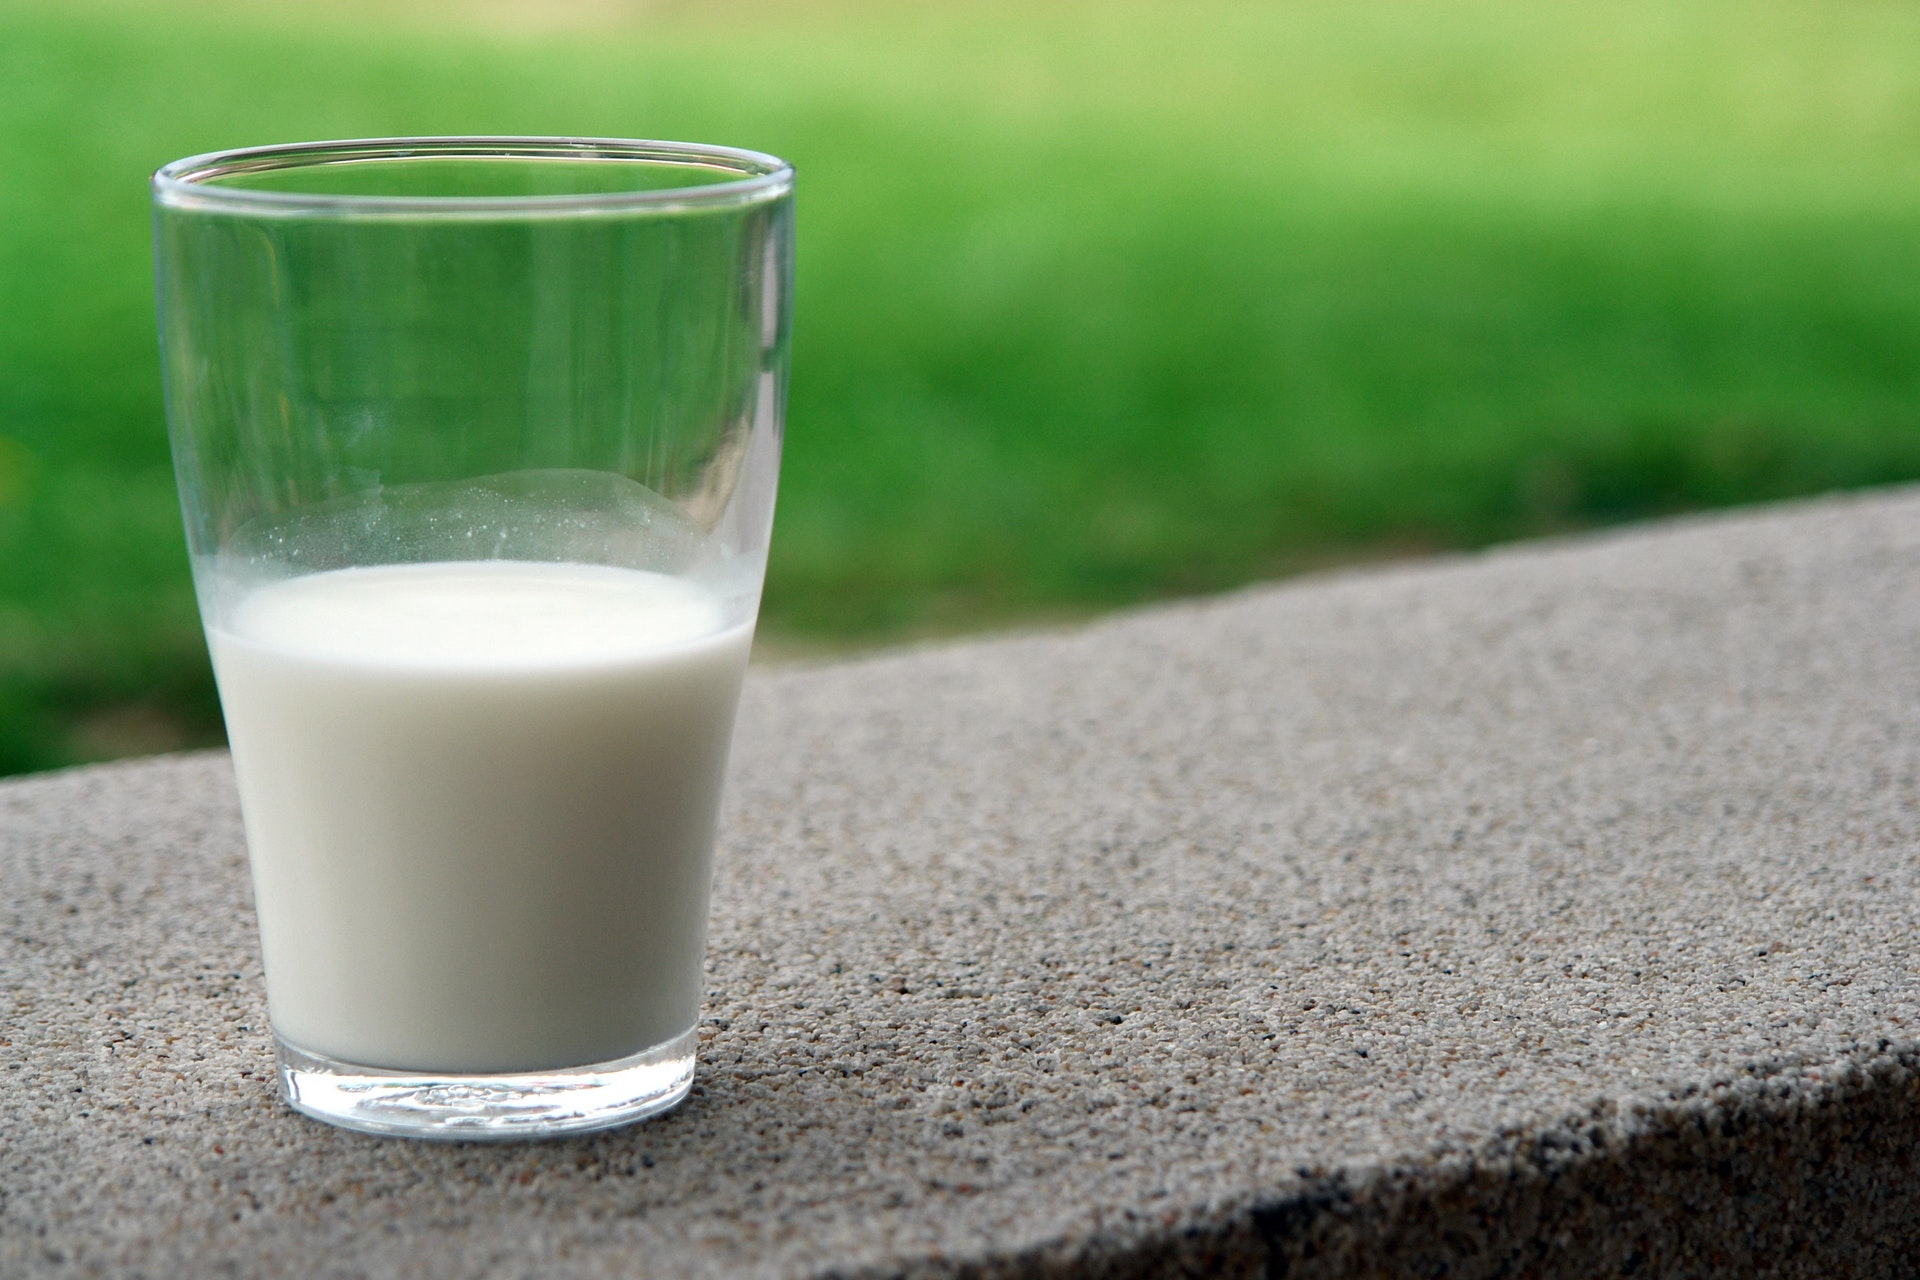 Mælk, arla, mad, madspild, drik, tørstig